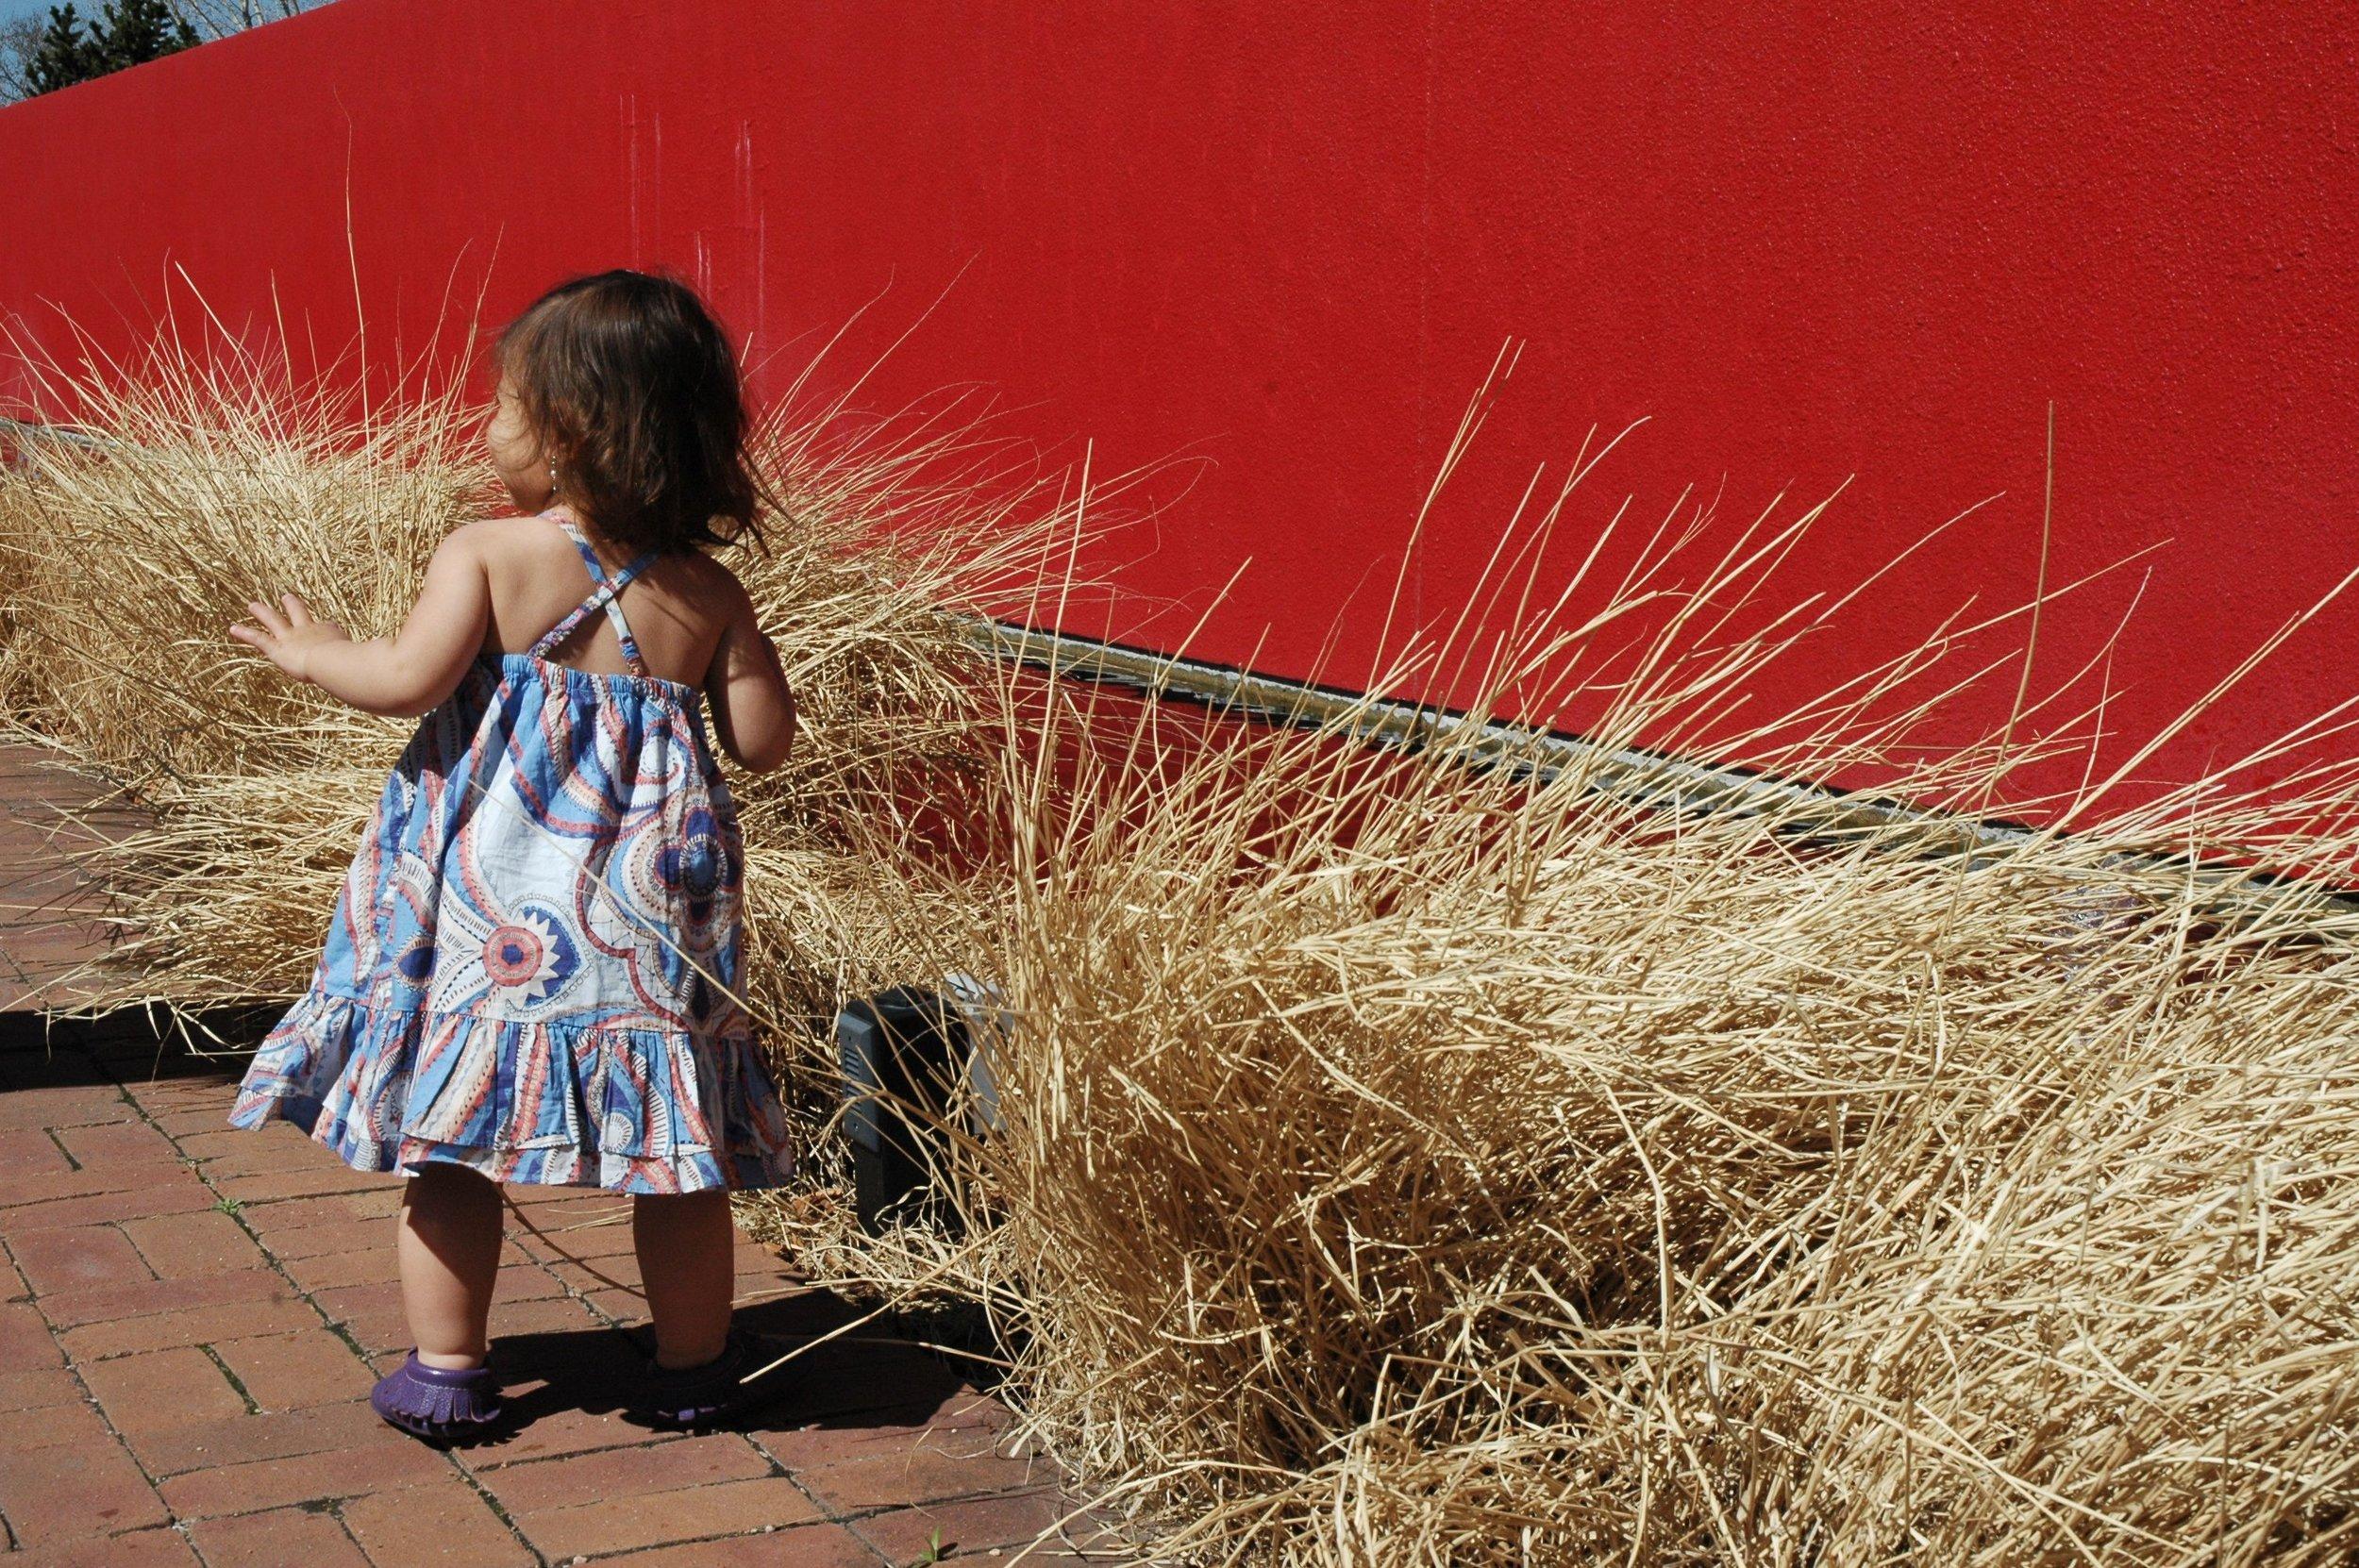 garden-remy-red-wall.jpg